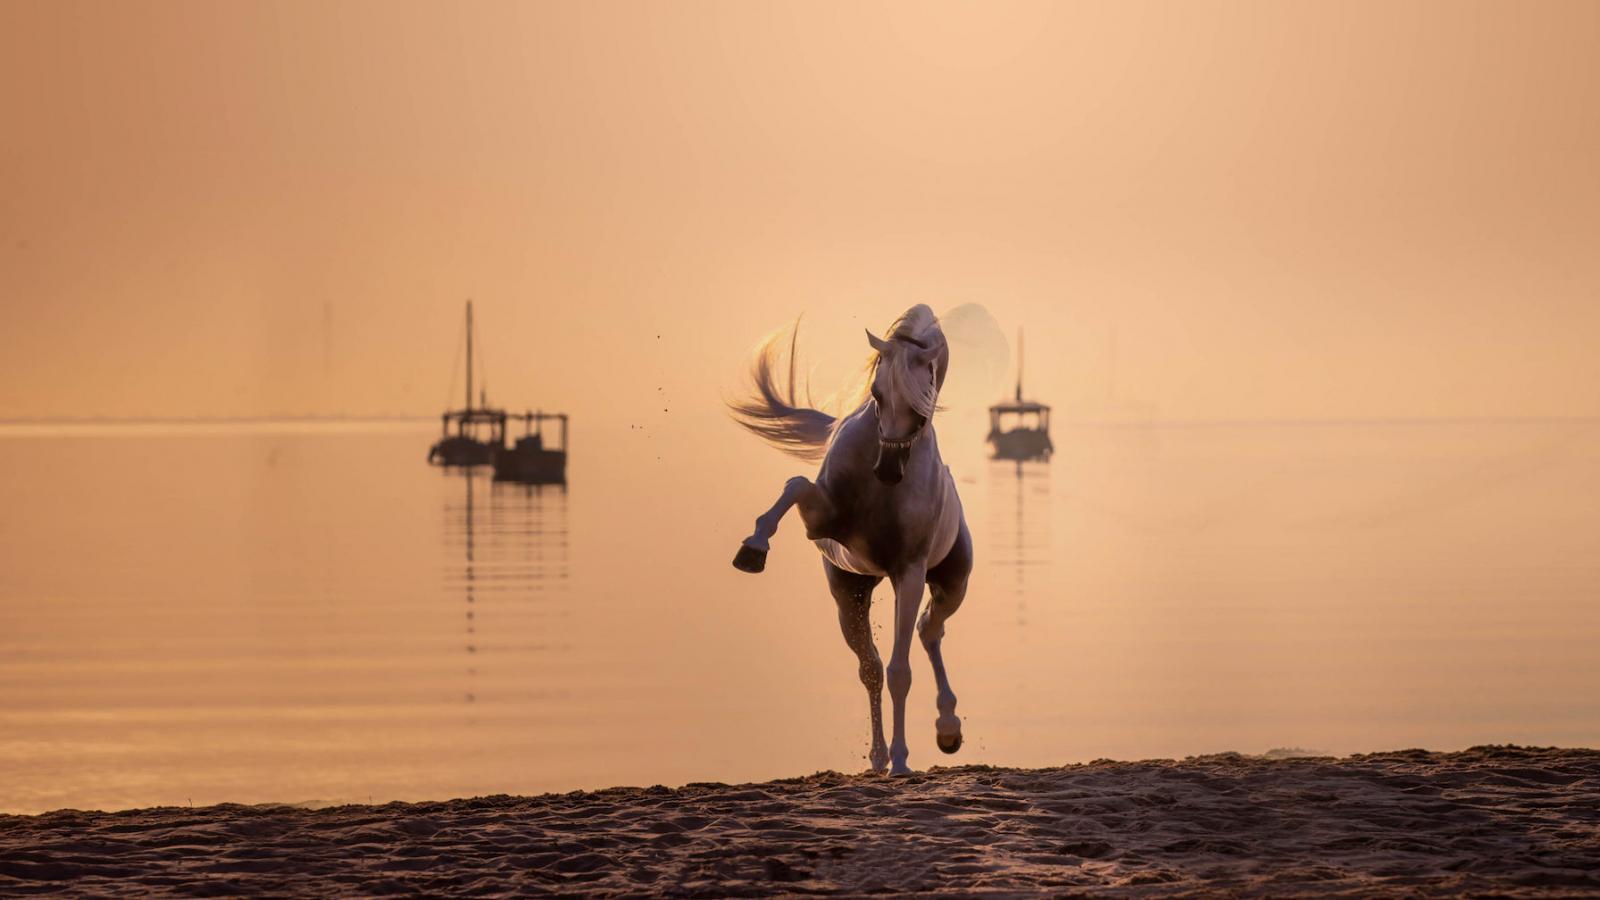 Title Show dates for Katara International Arabian Horse Festival amended